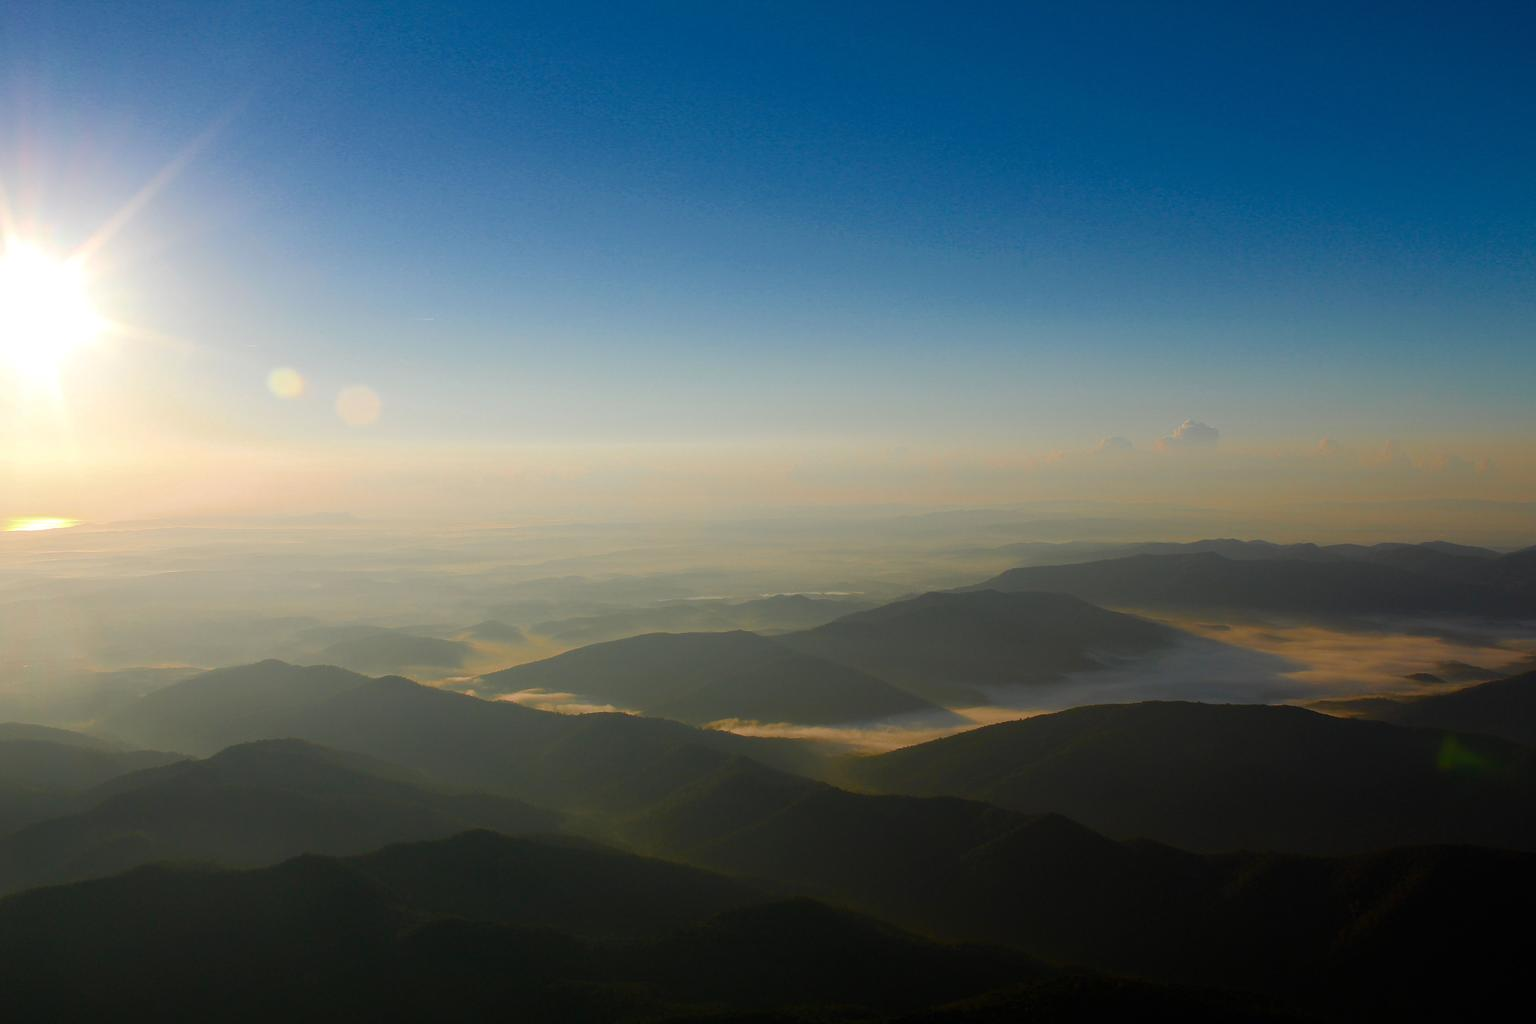 MÁS FOTOS, Catalonia Hot Air Balloon Ride and Breakfast over the Volcanoes of la Garrotxa